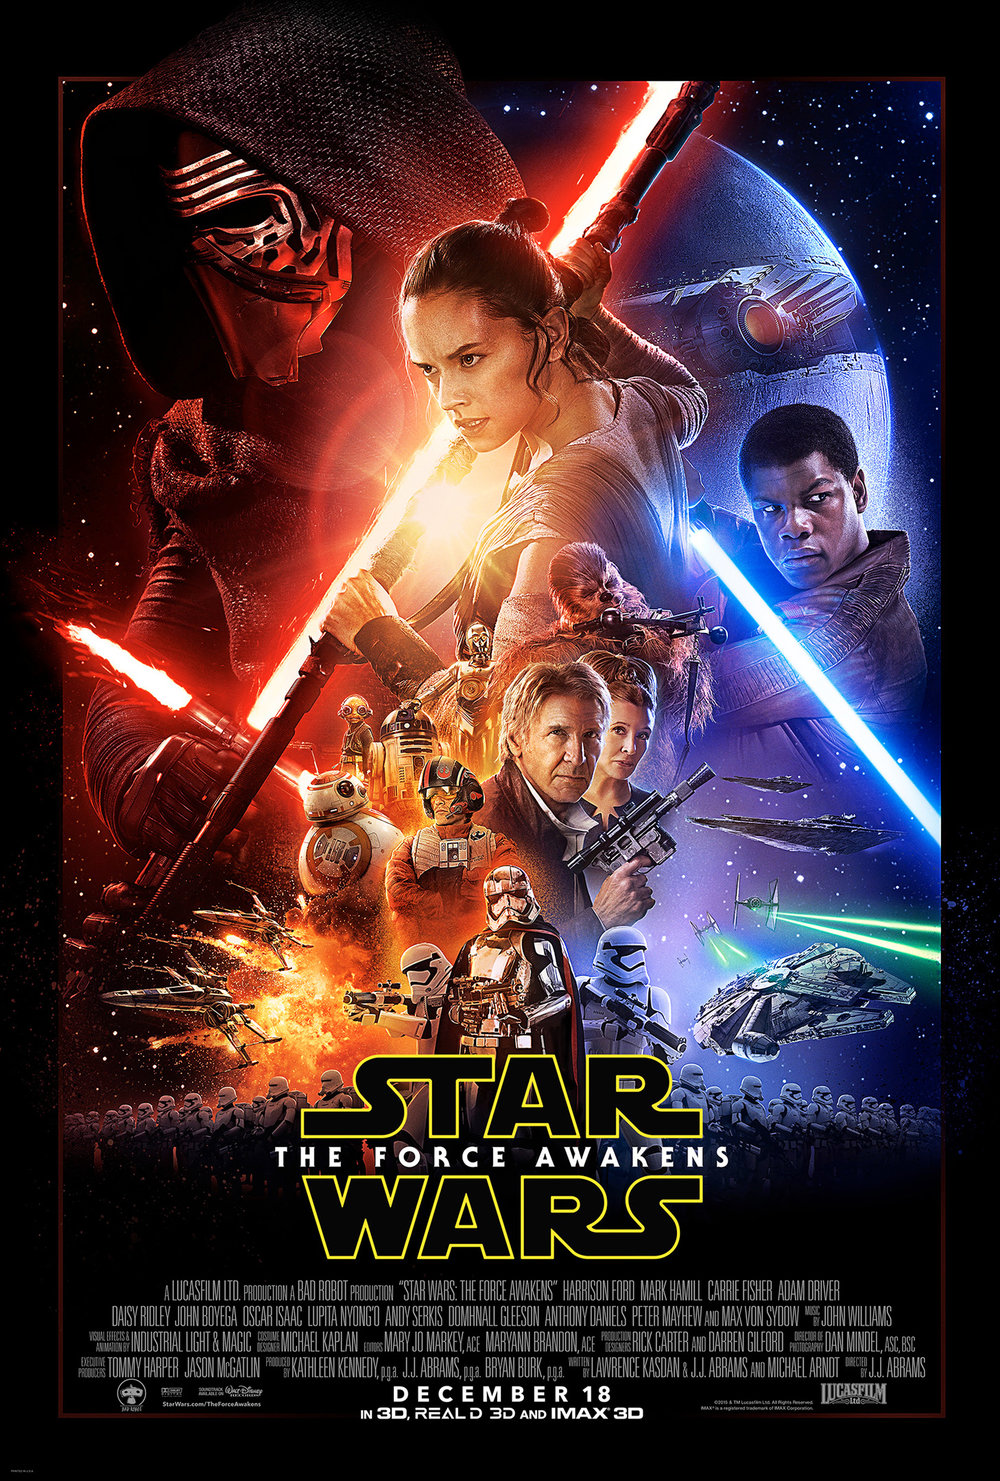 STAR WARS THE FORCE AWAKENS.jpg